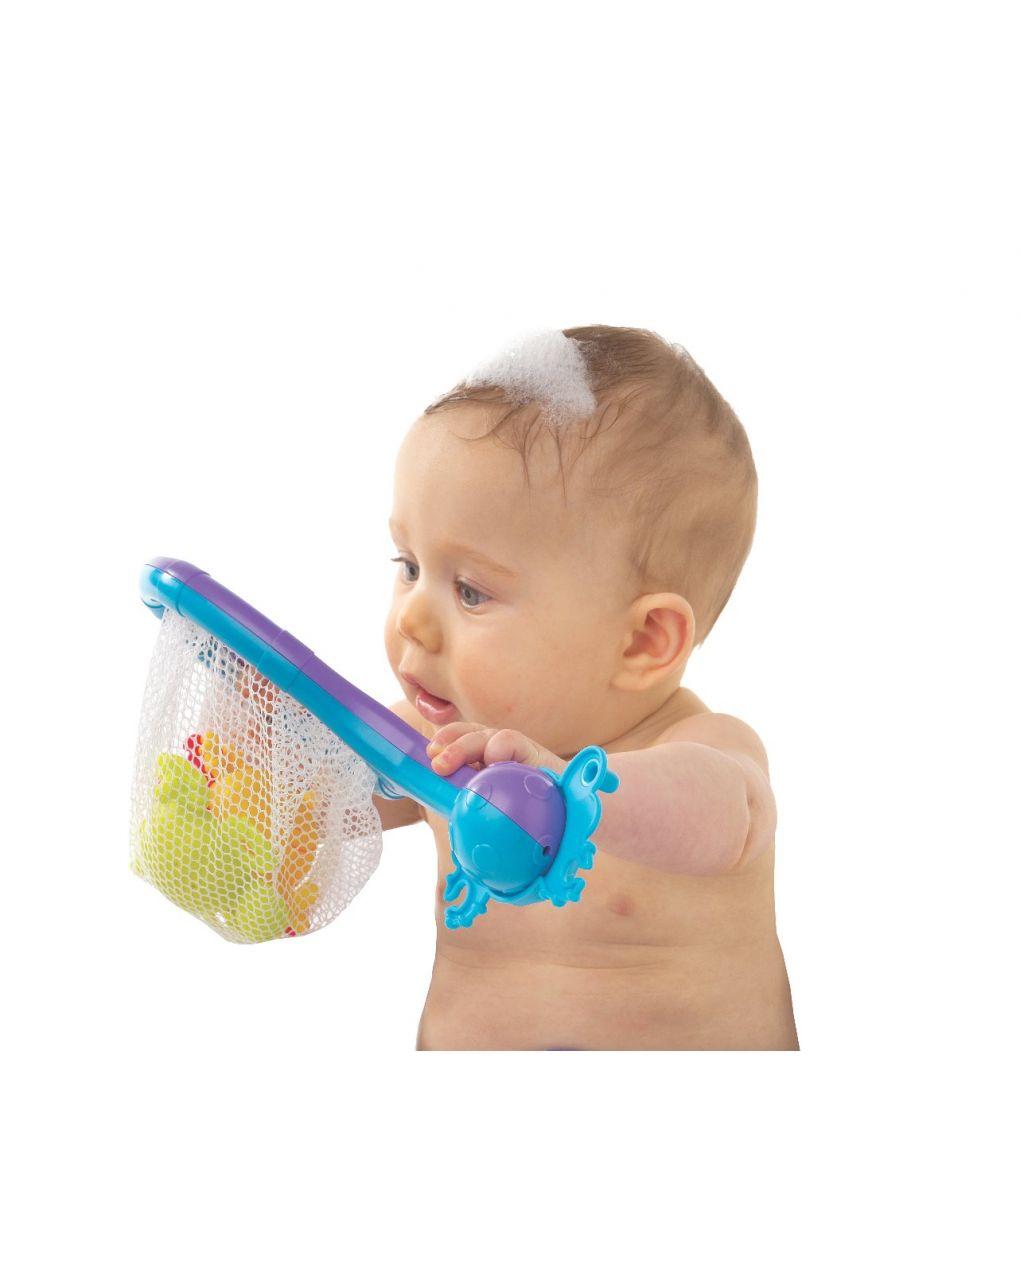 Playgro - scoop and splash bath set - Playgro